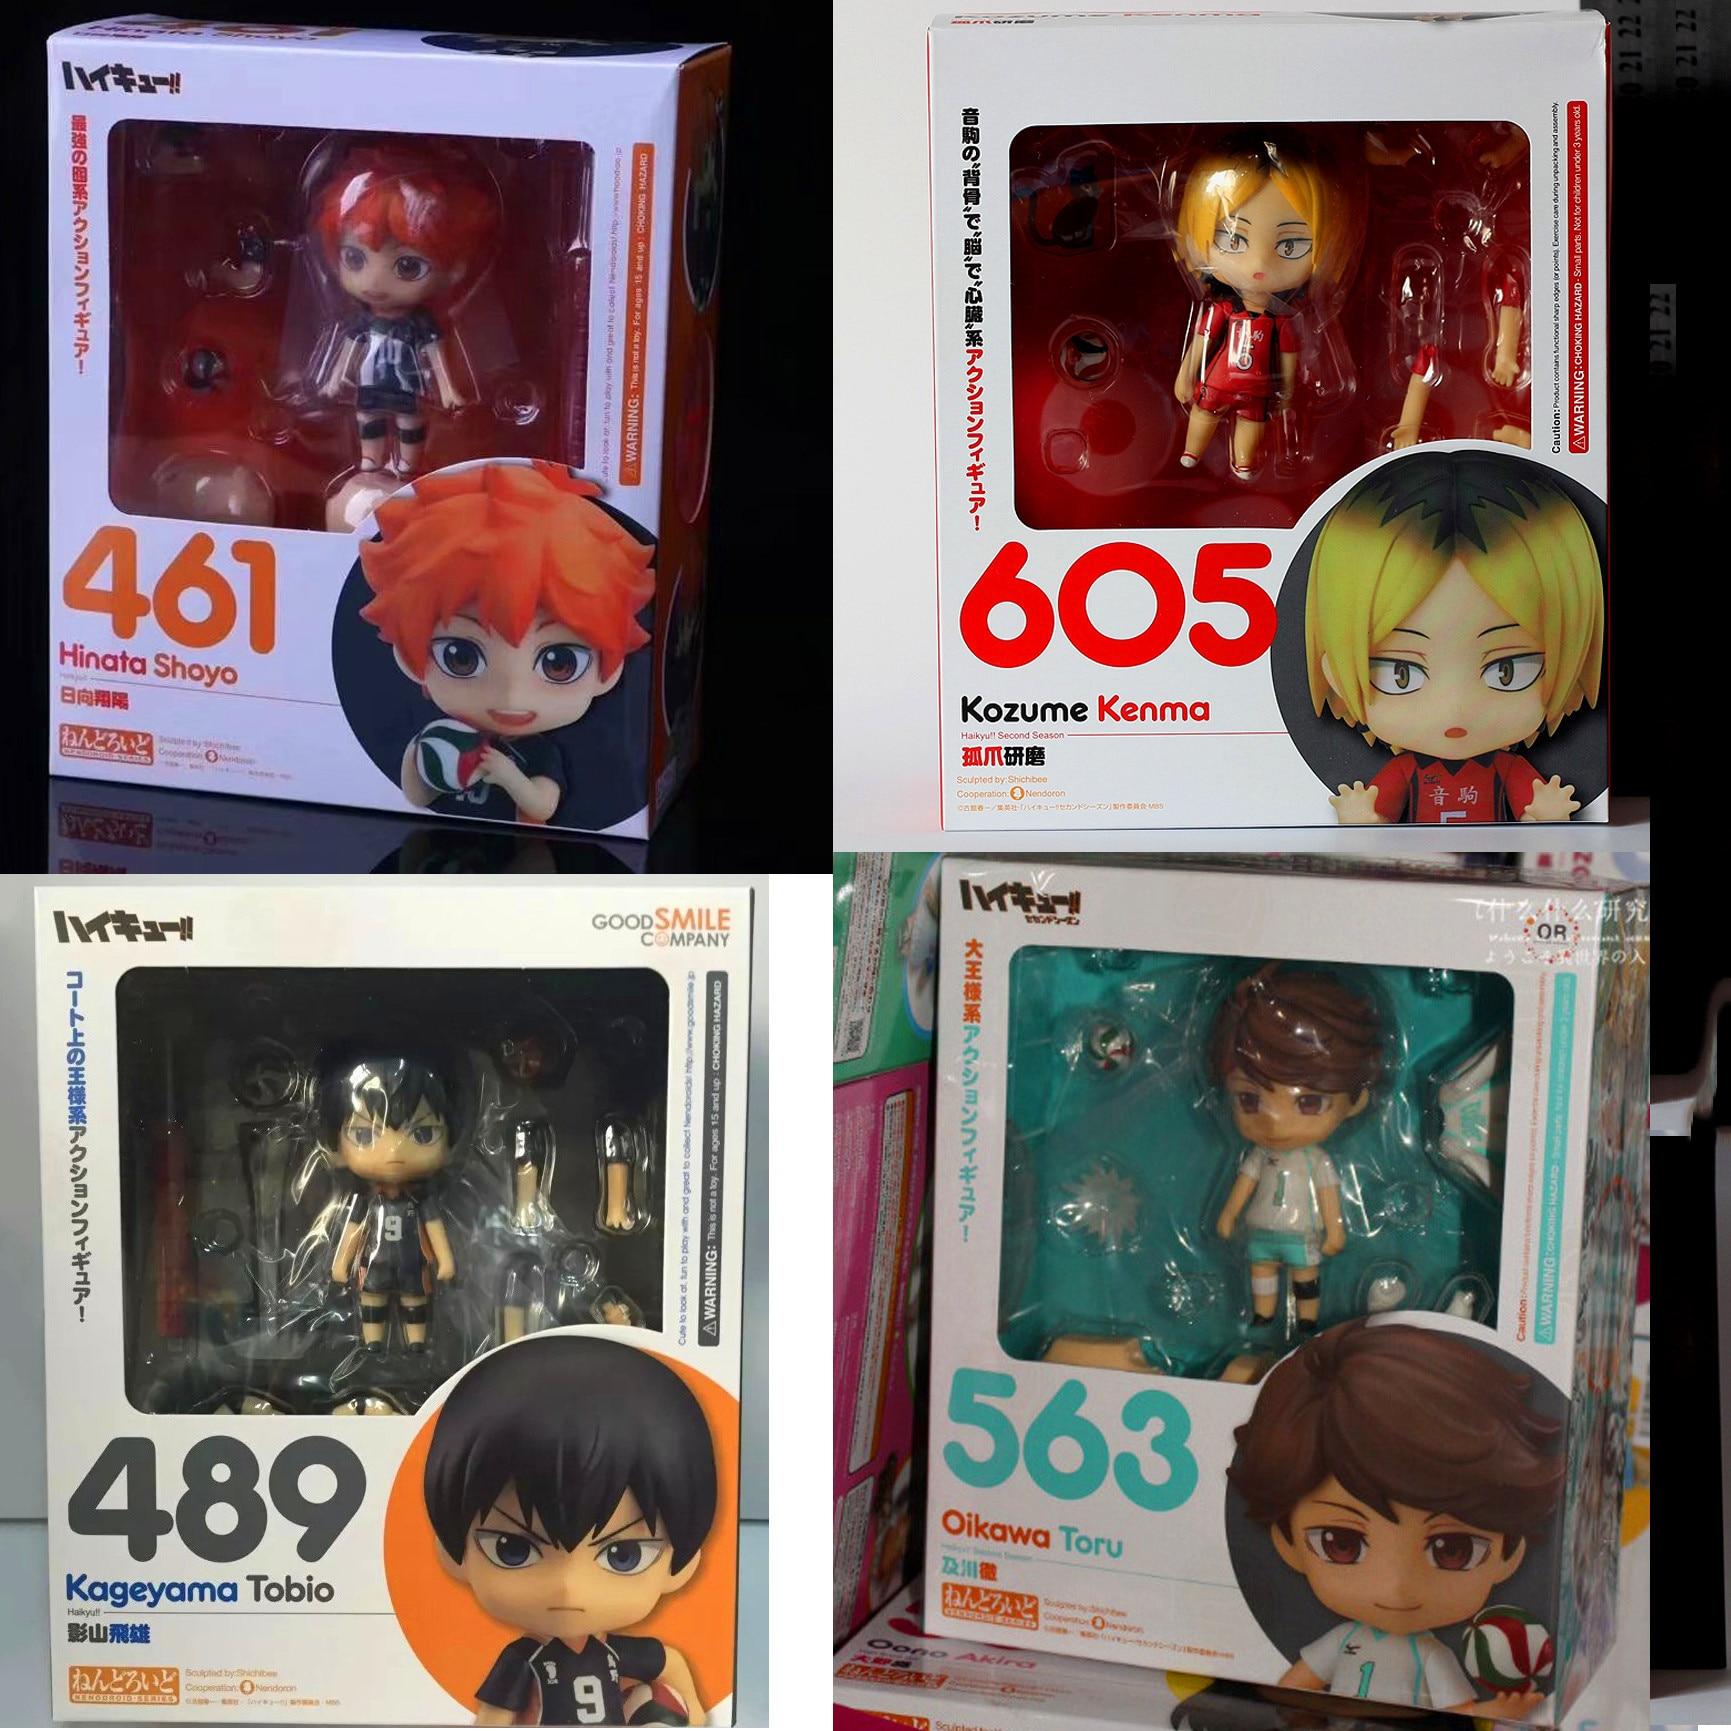 Haikyuu!! Action GSC 489# Kageyama Tobio 461# 605# 563# Q Version Clay Doll Face Changing Haikyuu Hinata Nekoma Kenma Model Toys